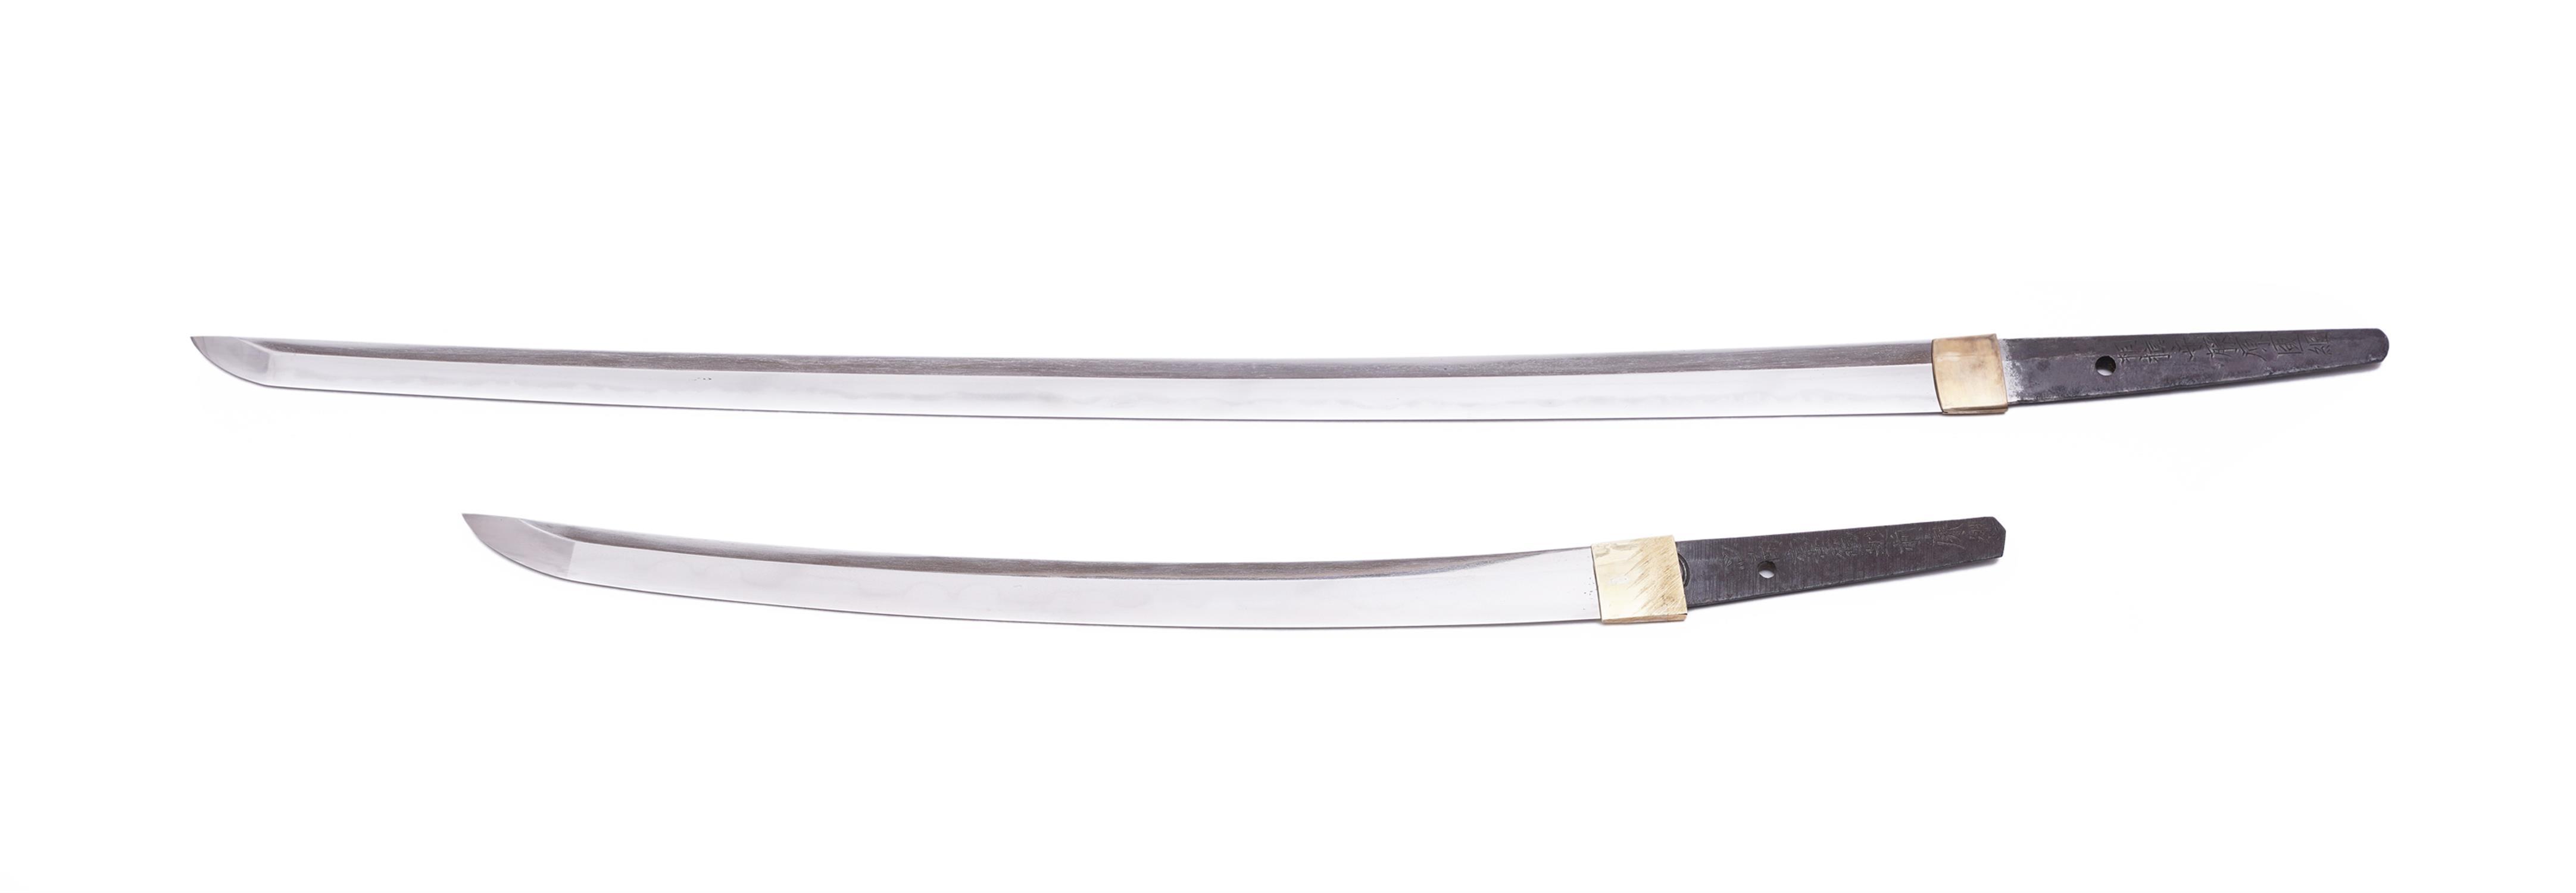 .A PAIR OF SAMURAI SWORDS, DAISHO Japan 1. Description of the katana: The katana is Shinto according - Image 4 of 24